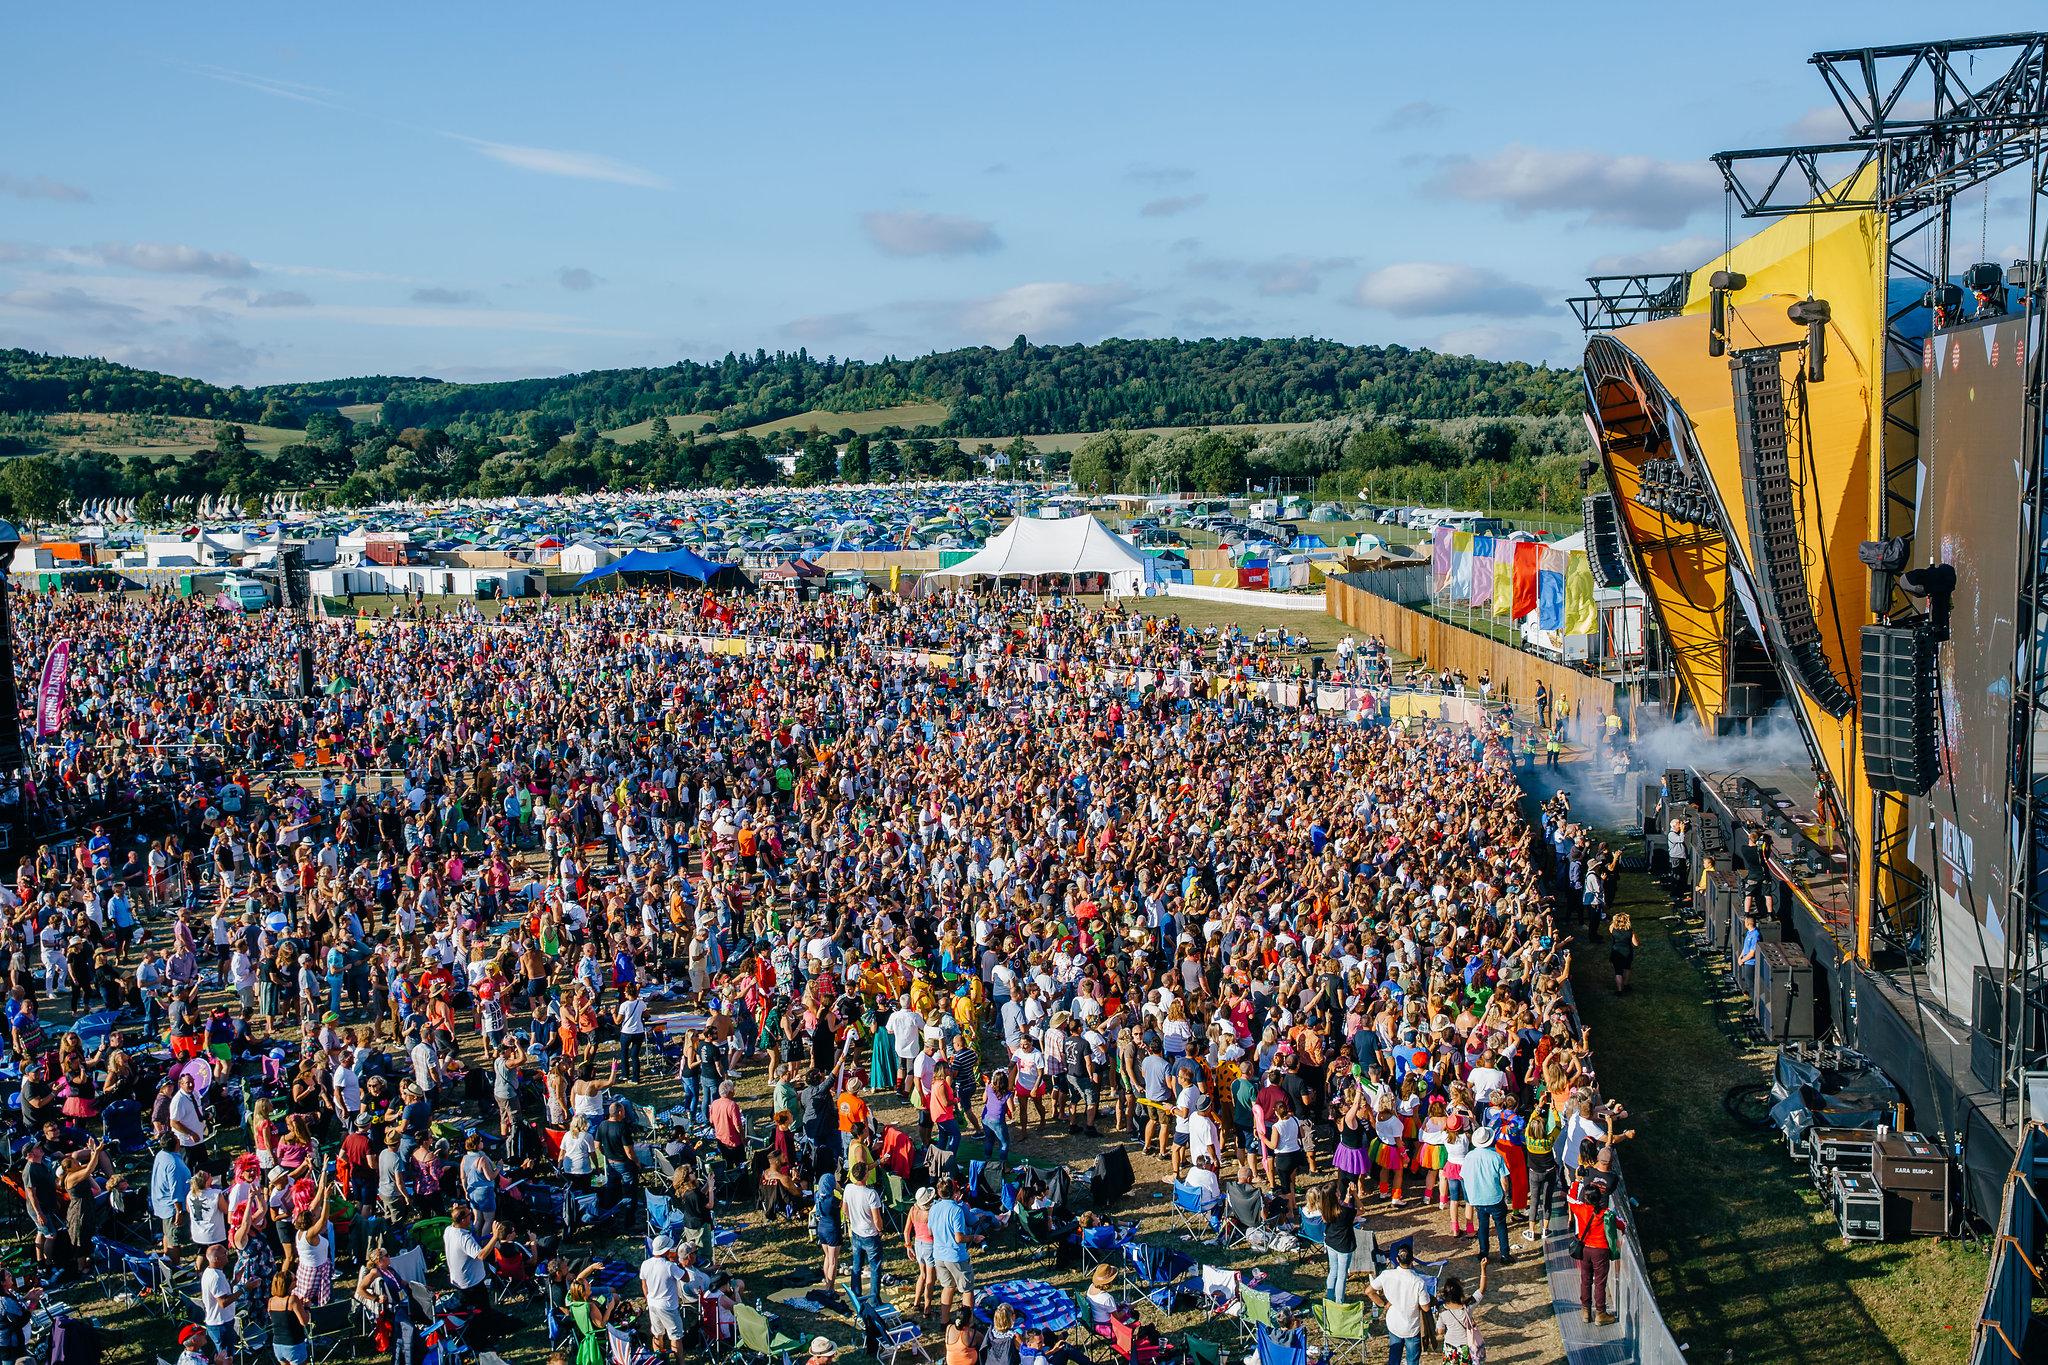 Can I get a Rewind? 2019 Rewind Festival details announced